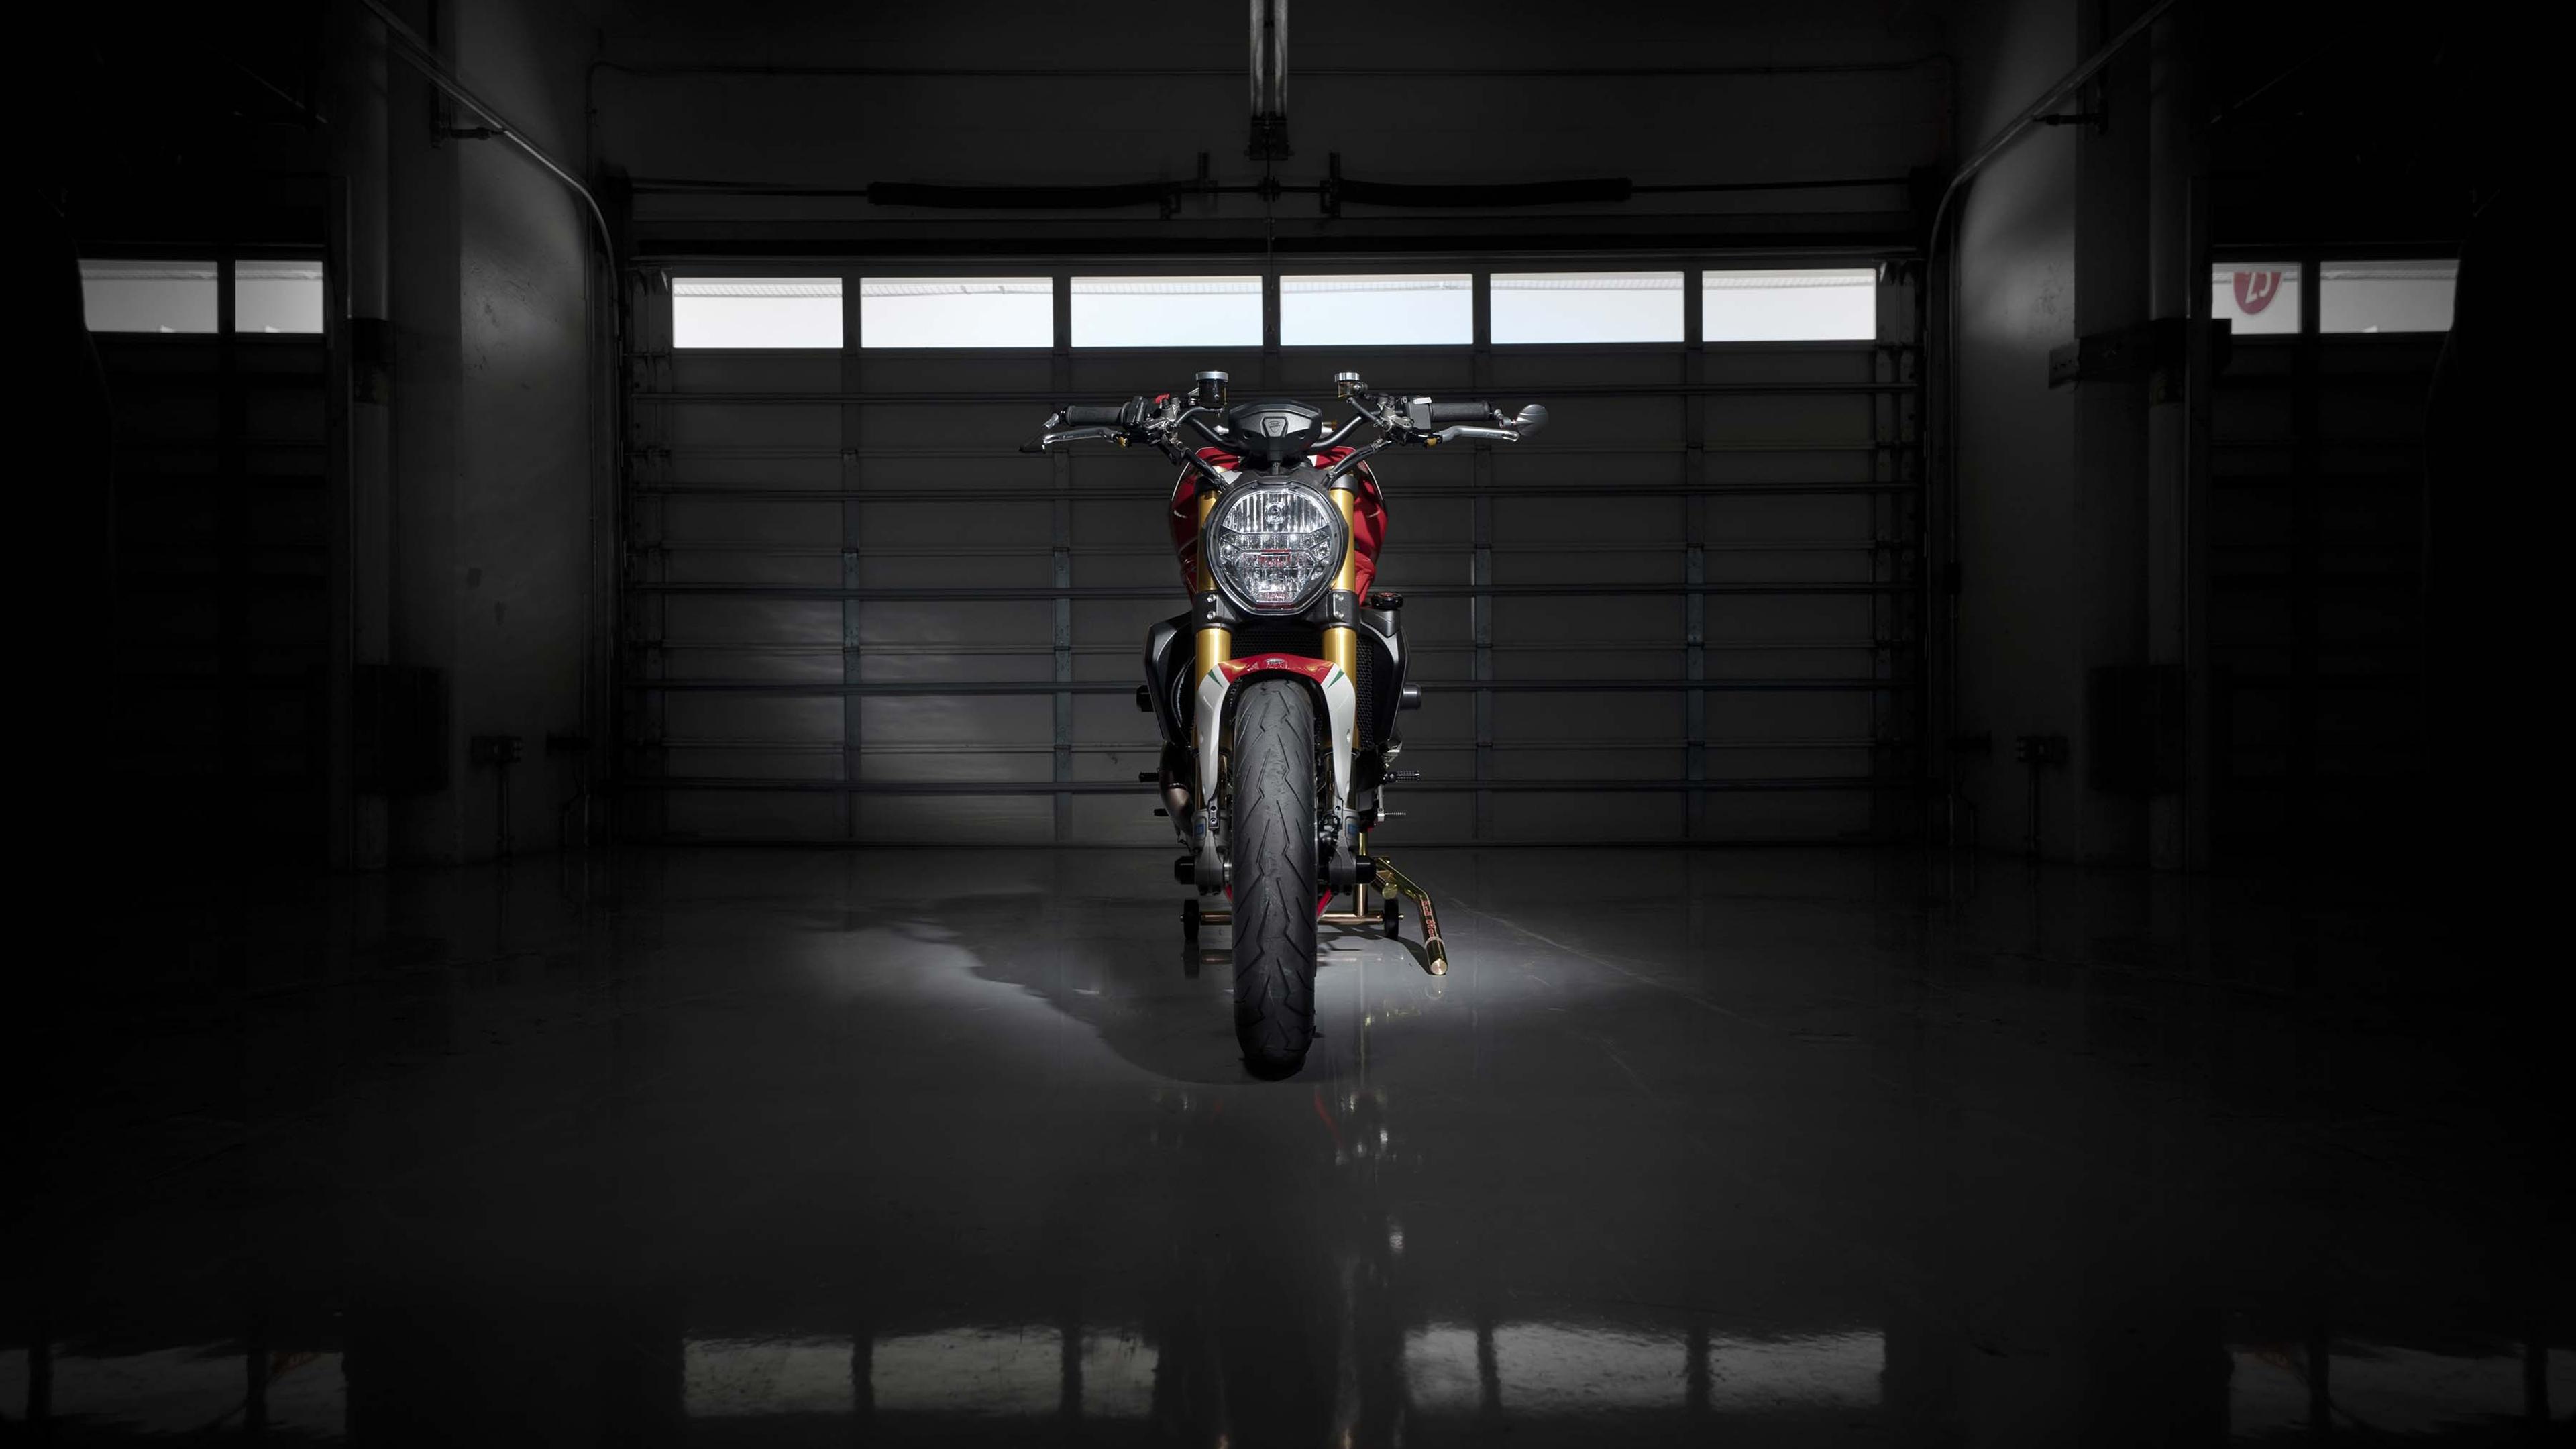 2019 Ducati monster 1200 триколор по мотивации обои скачать